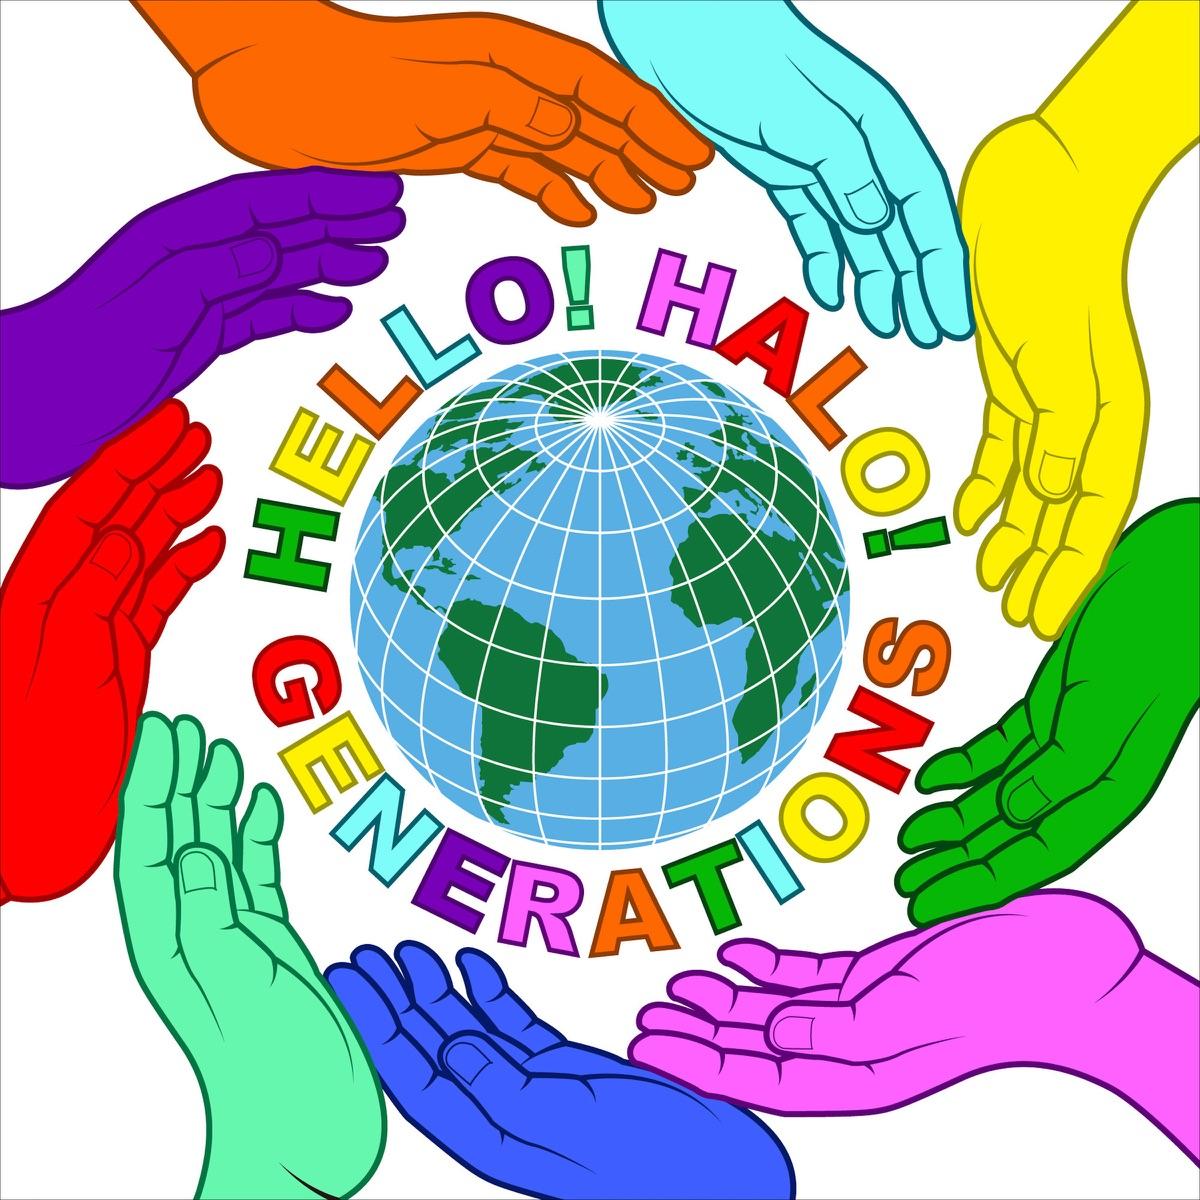 『GENERATIONS from EXILE TRIBE - HELLO! HALO!』収録の『HELLO! HALO!』ジャケット